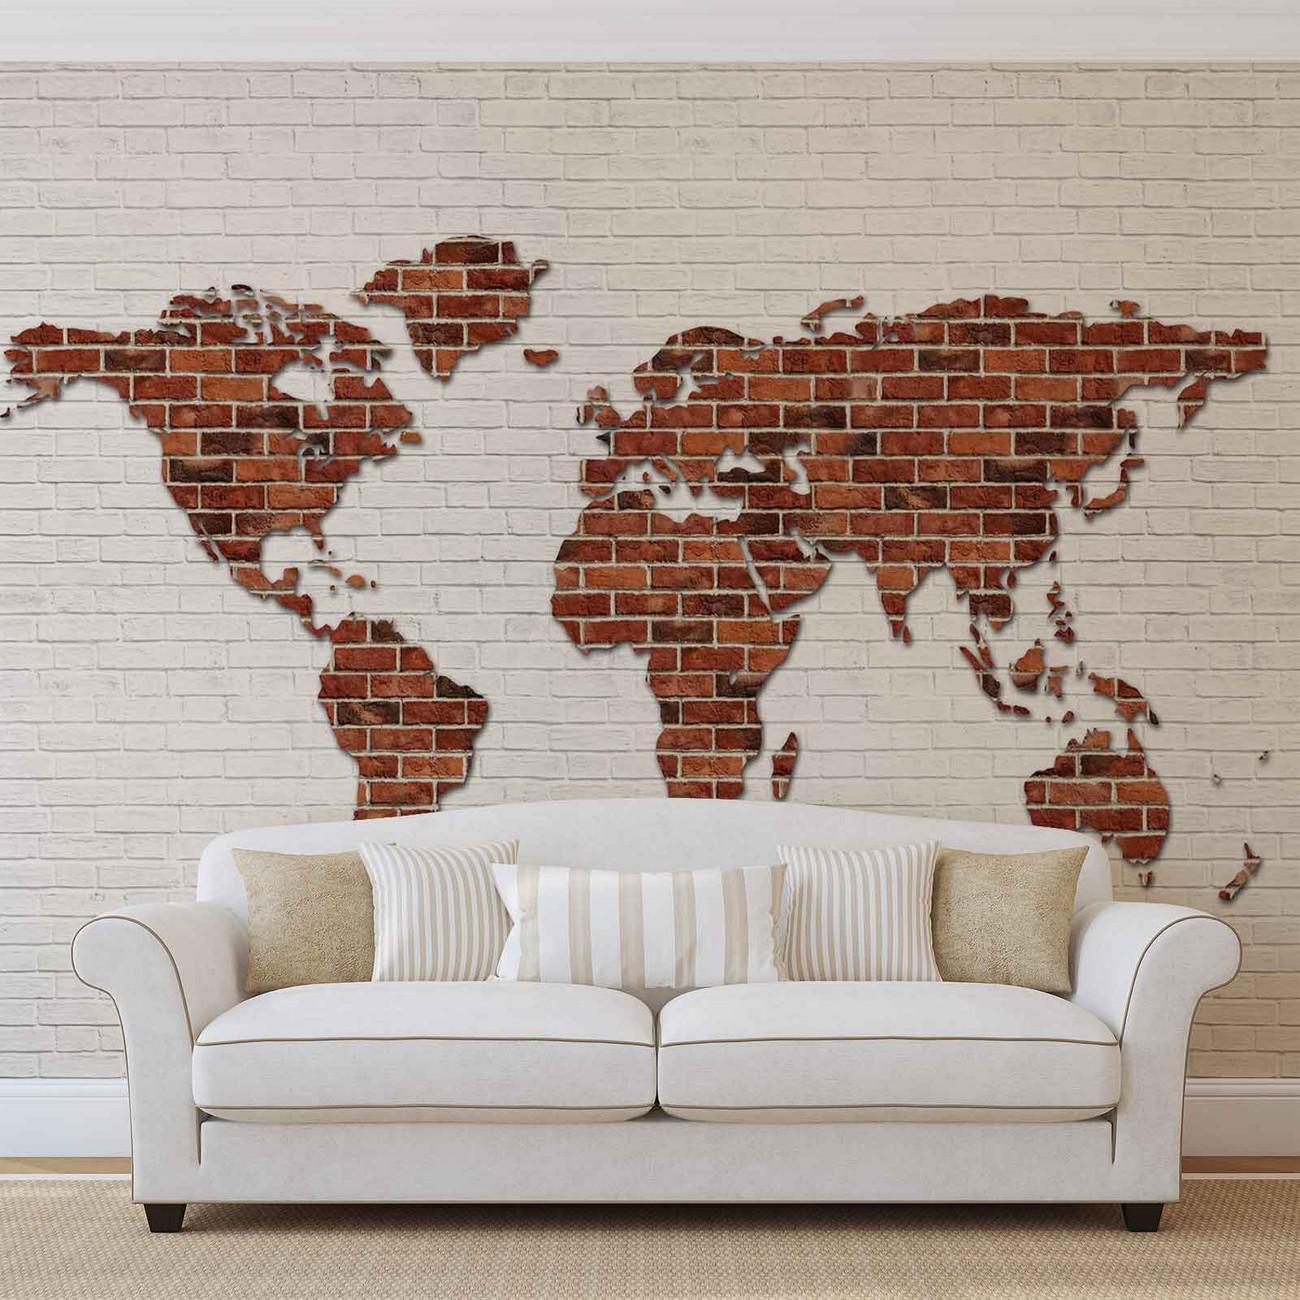 Fotomurale pared del ladrillo mapa del mundo papel for Fotomurales pared